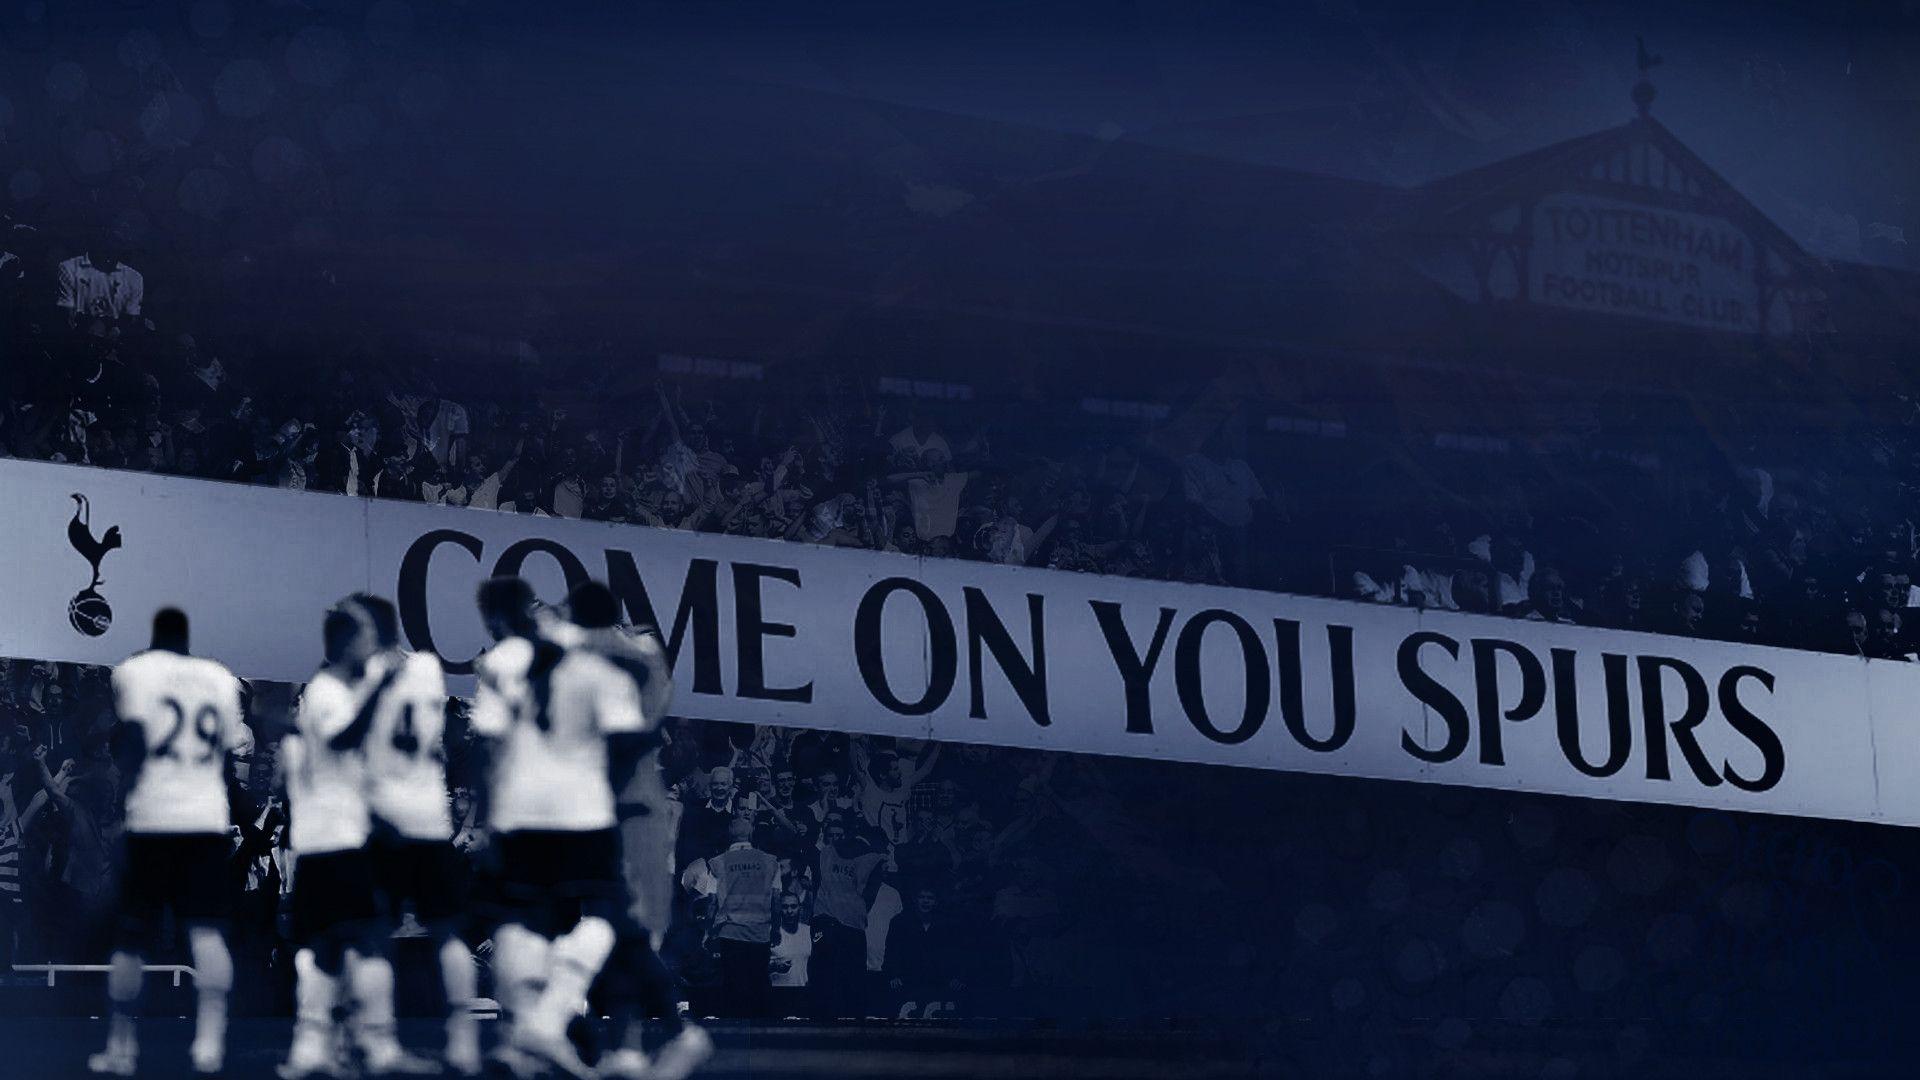 Come On You Spurs Tottenham Hotspur Football Club